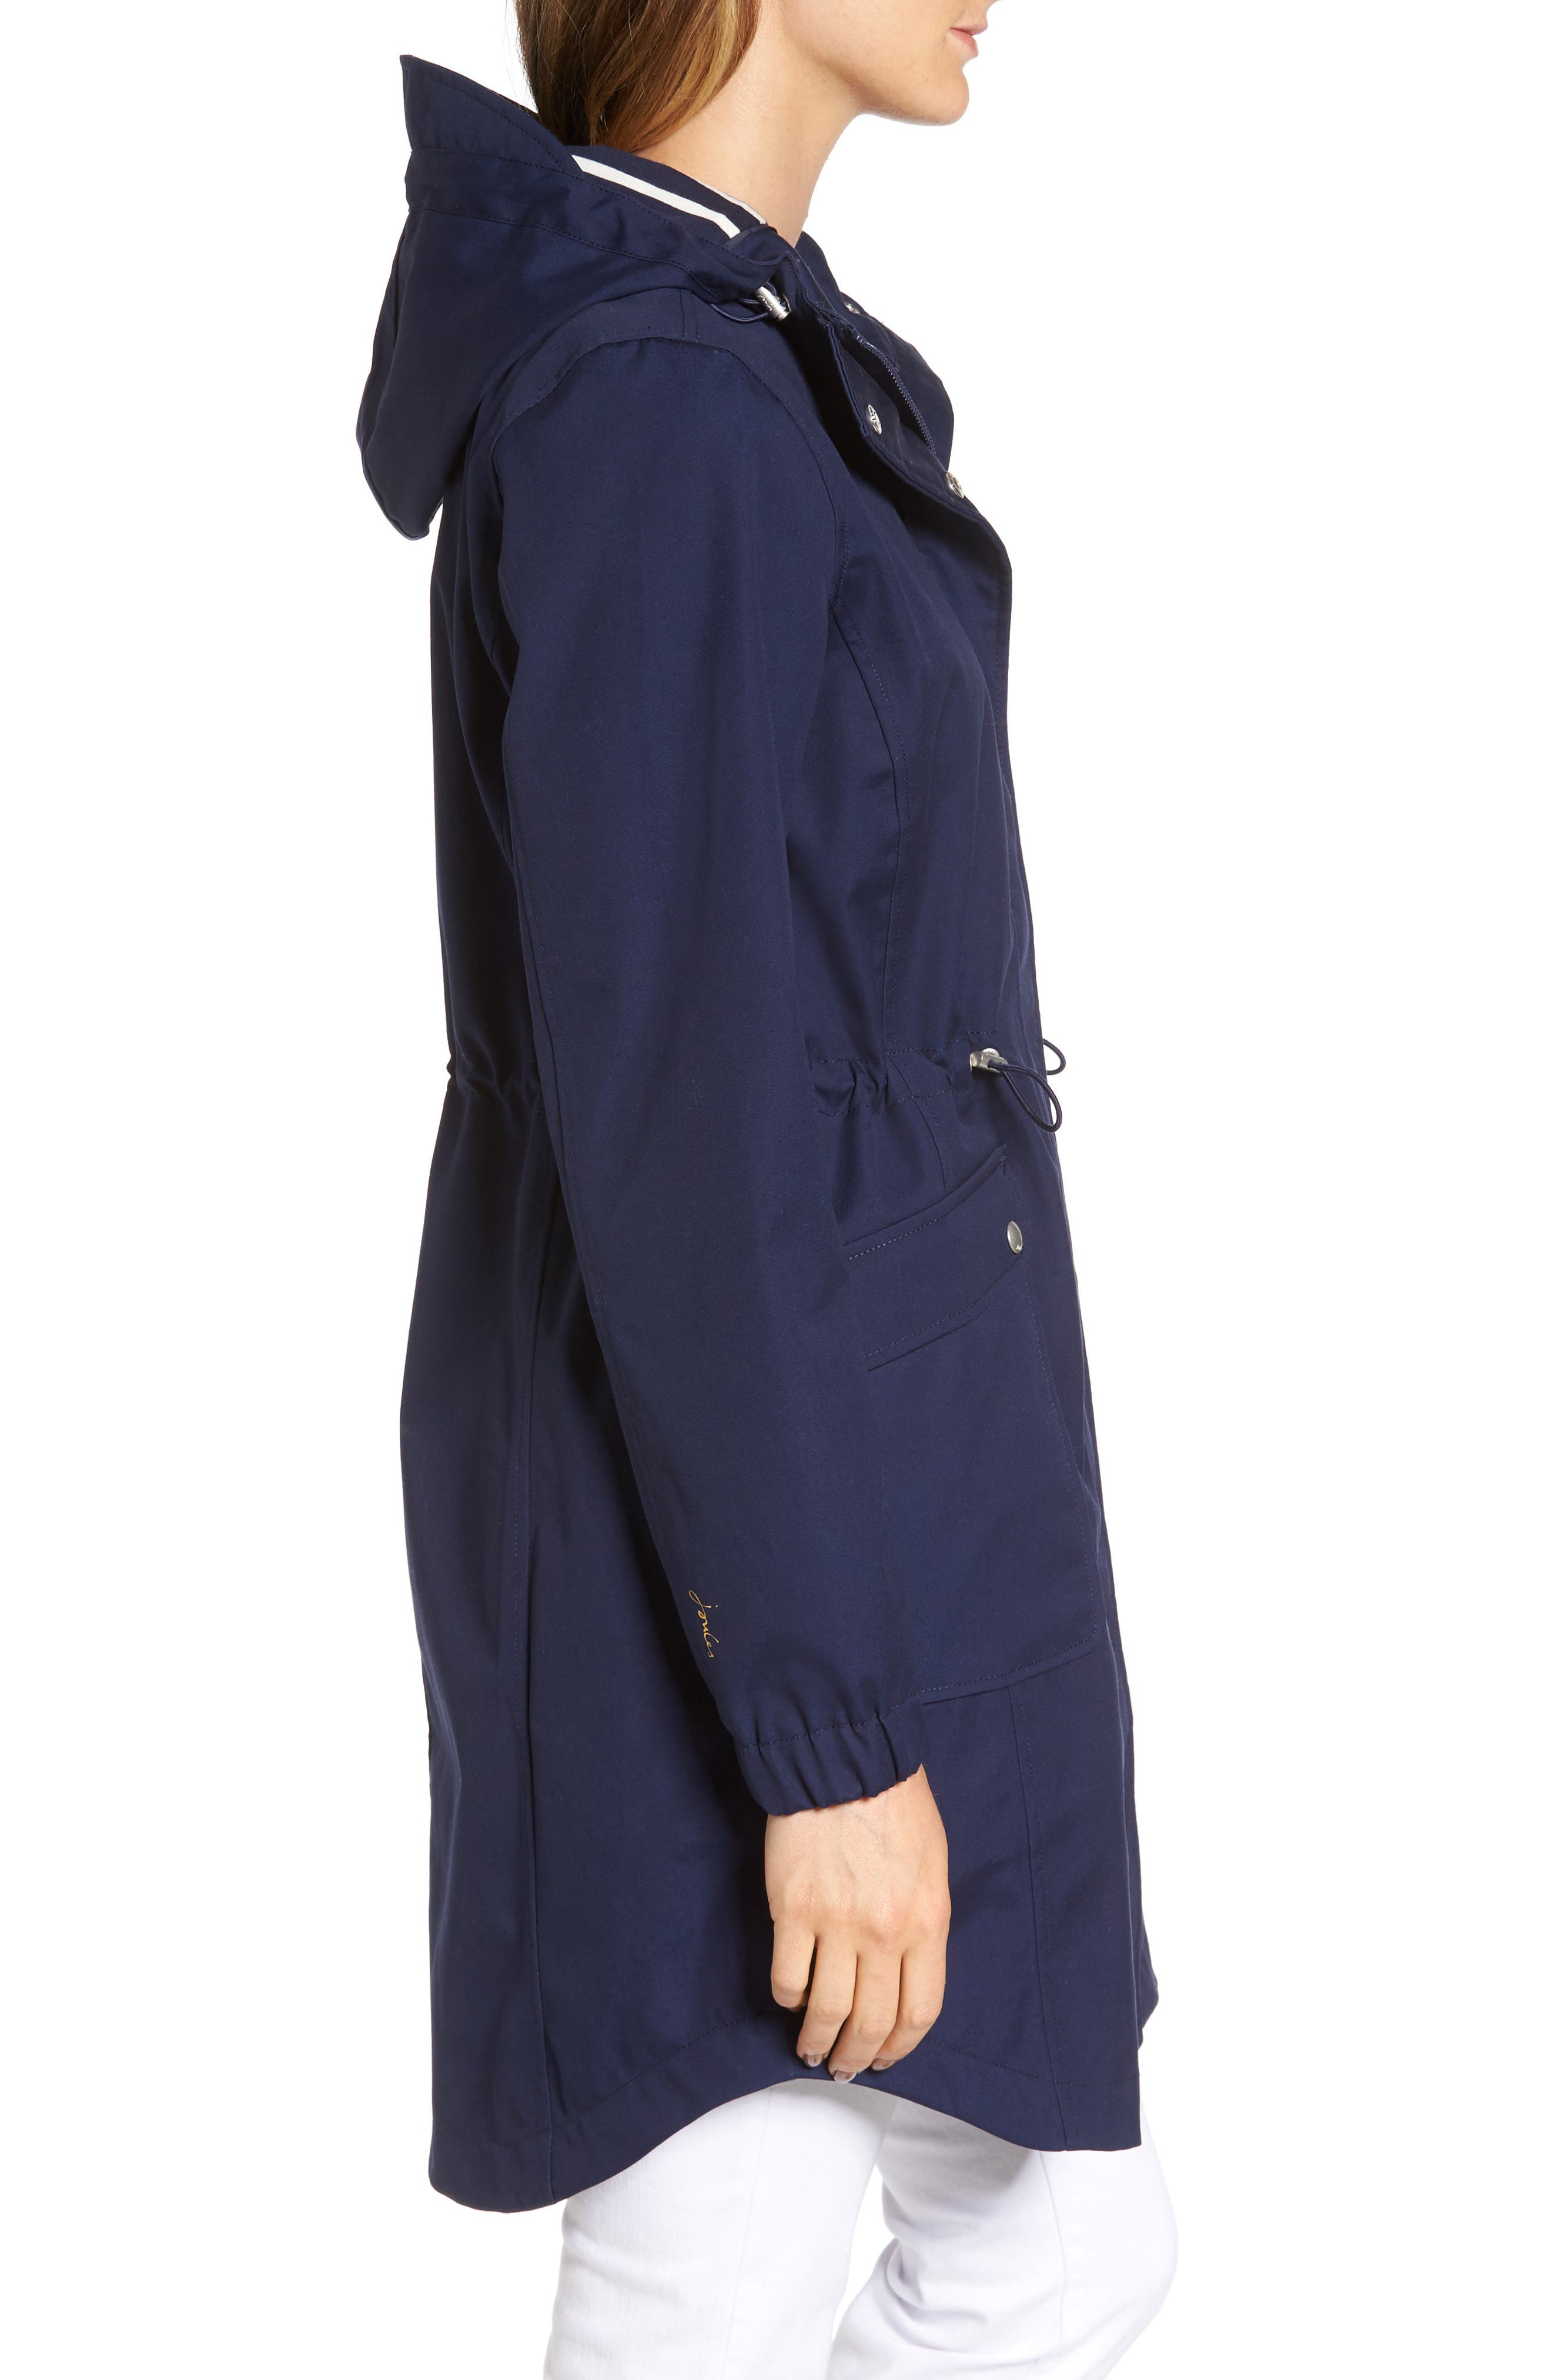 Right as Rain Waterproof Hooded Jacket,                             Alternate thumbnail 3, color,                             411